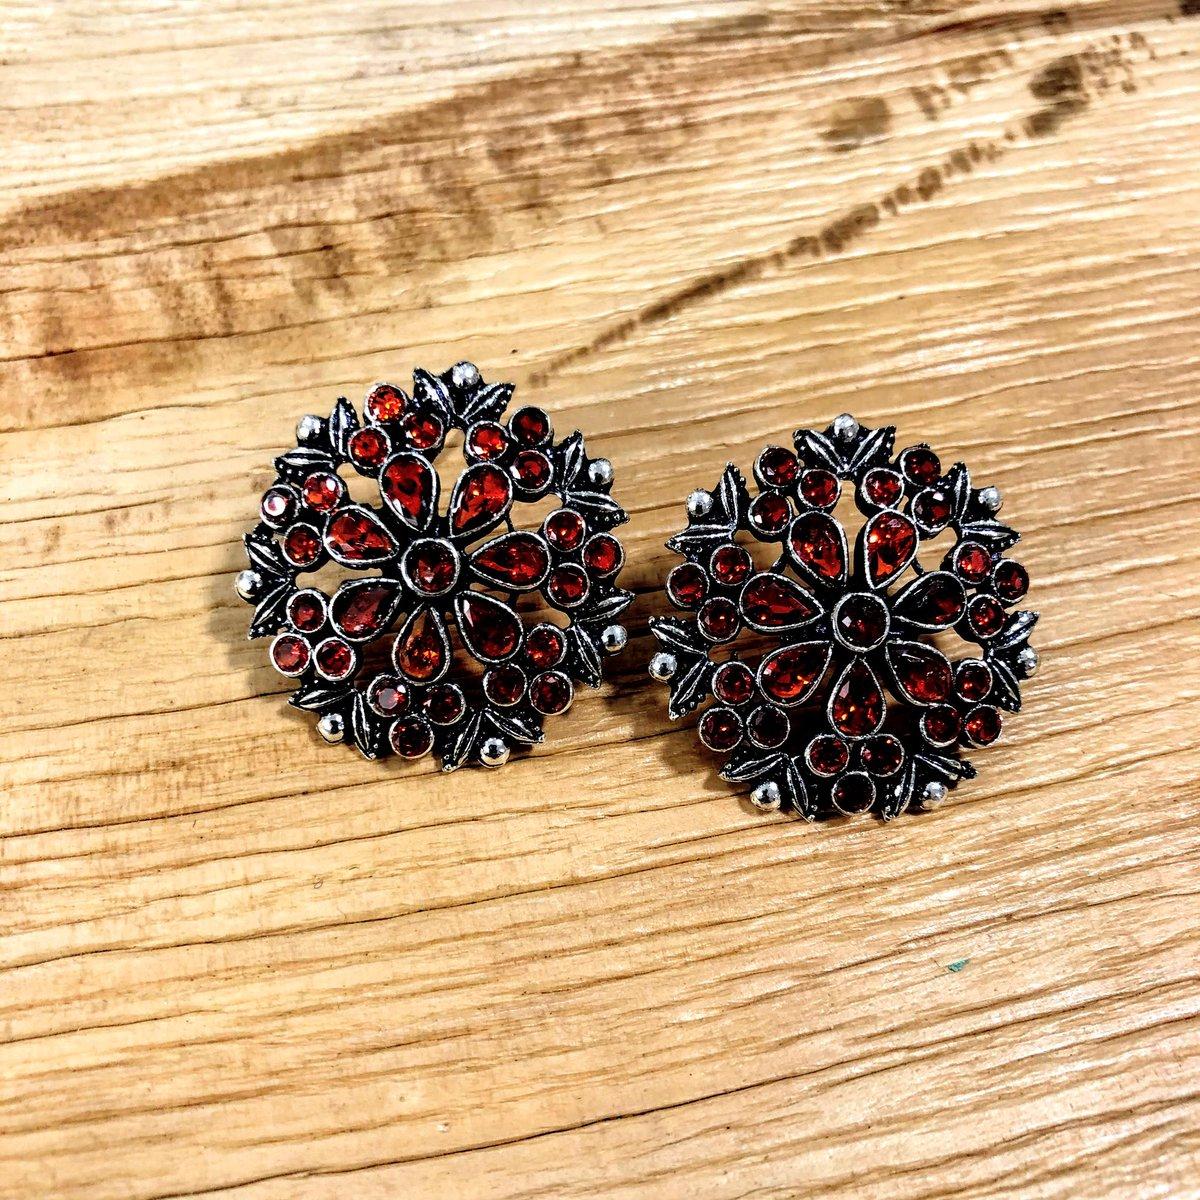 Traditional Oxidised Stone Stud Earrings  #fashion #accessories #jewellery #jewelry #oxidised #oxidisedjewellery #oxidisedearrings #stone #earrings #studs #studearrings #indianwear #ladieswear #womenswear #fashionjewelry #womensfashion #womensaccessories #womensjewellerypic.twitter.com/AidVEgVVFE